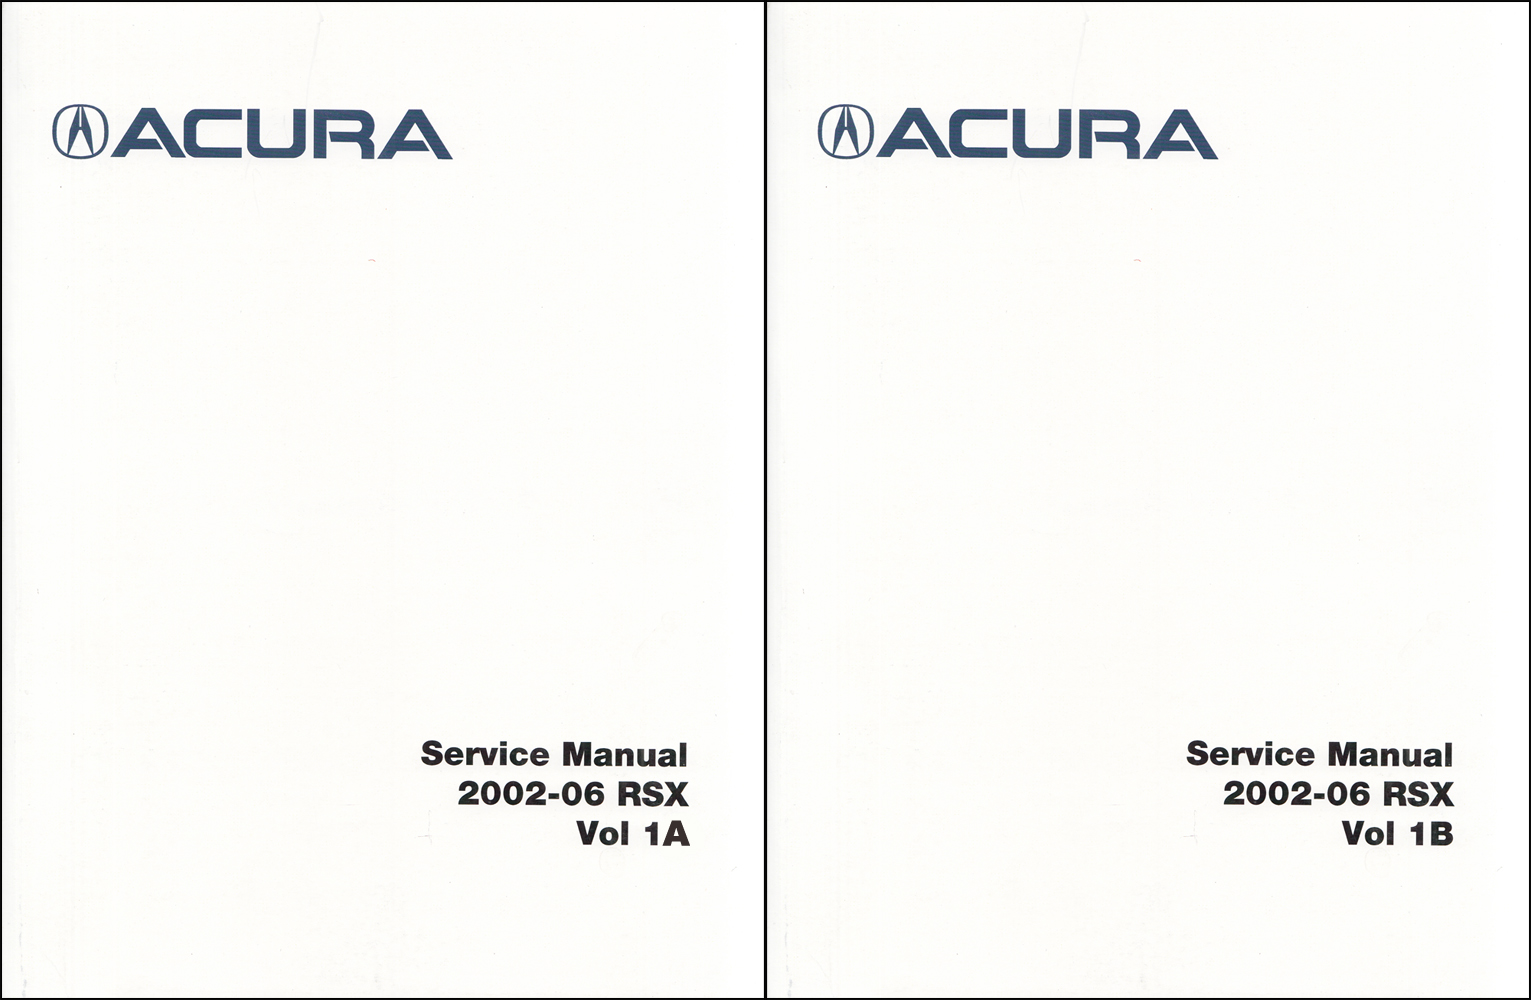 Acura Rsx Owners Manual Original